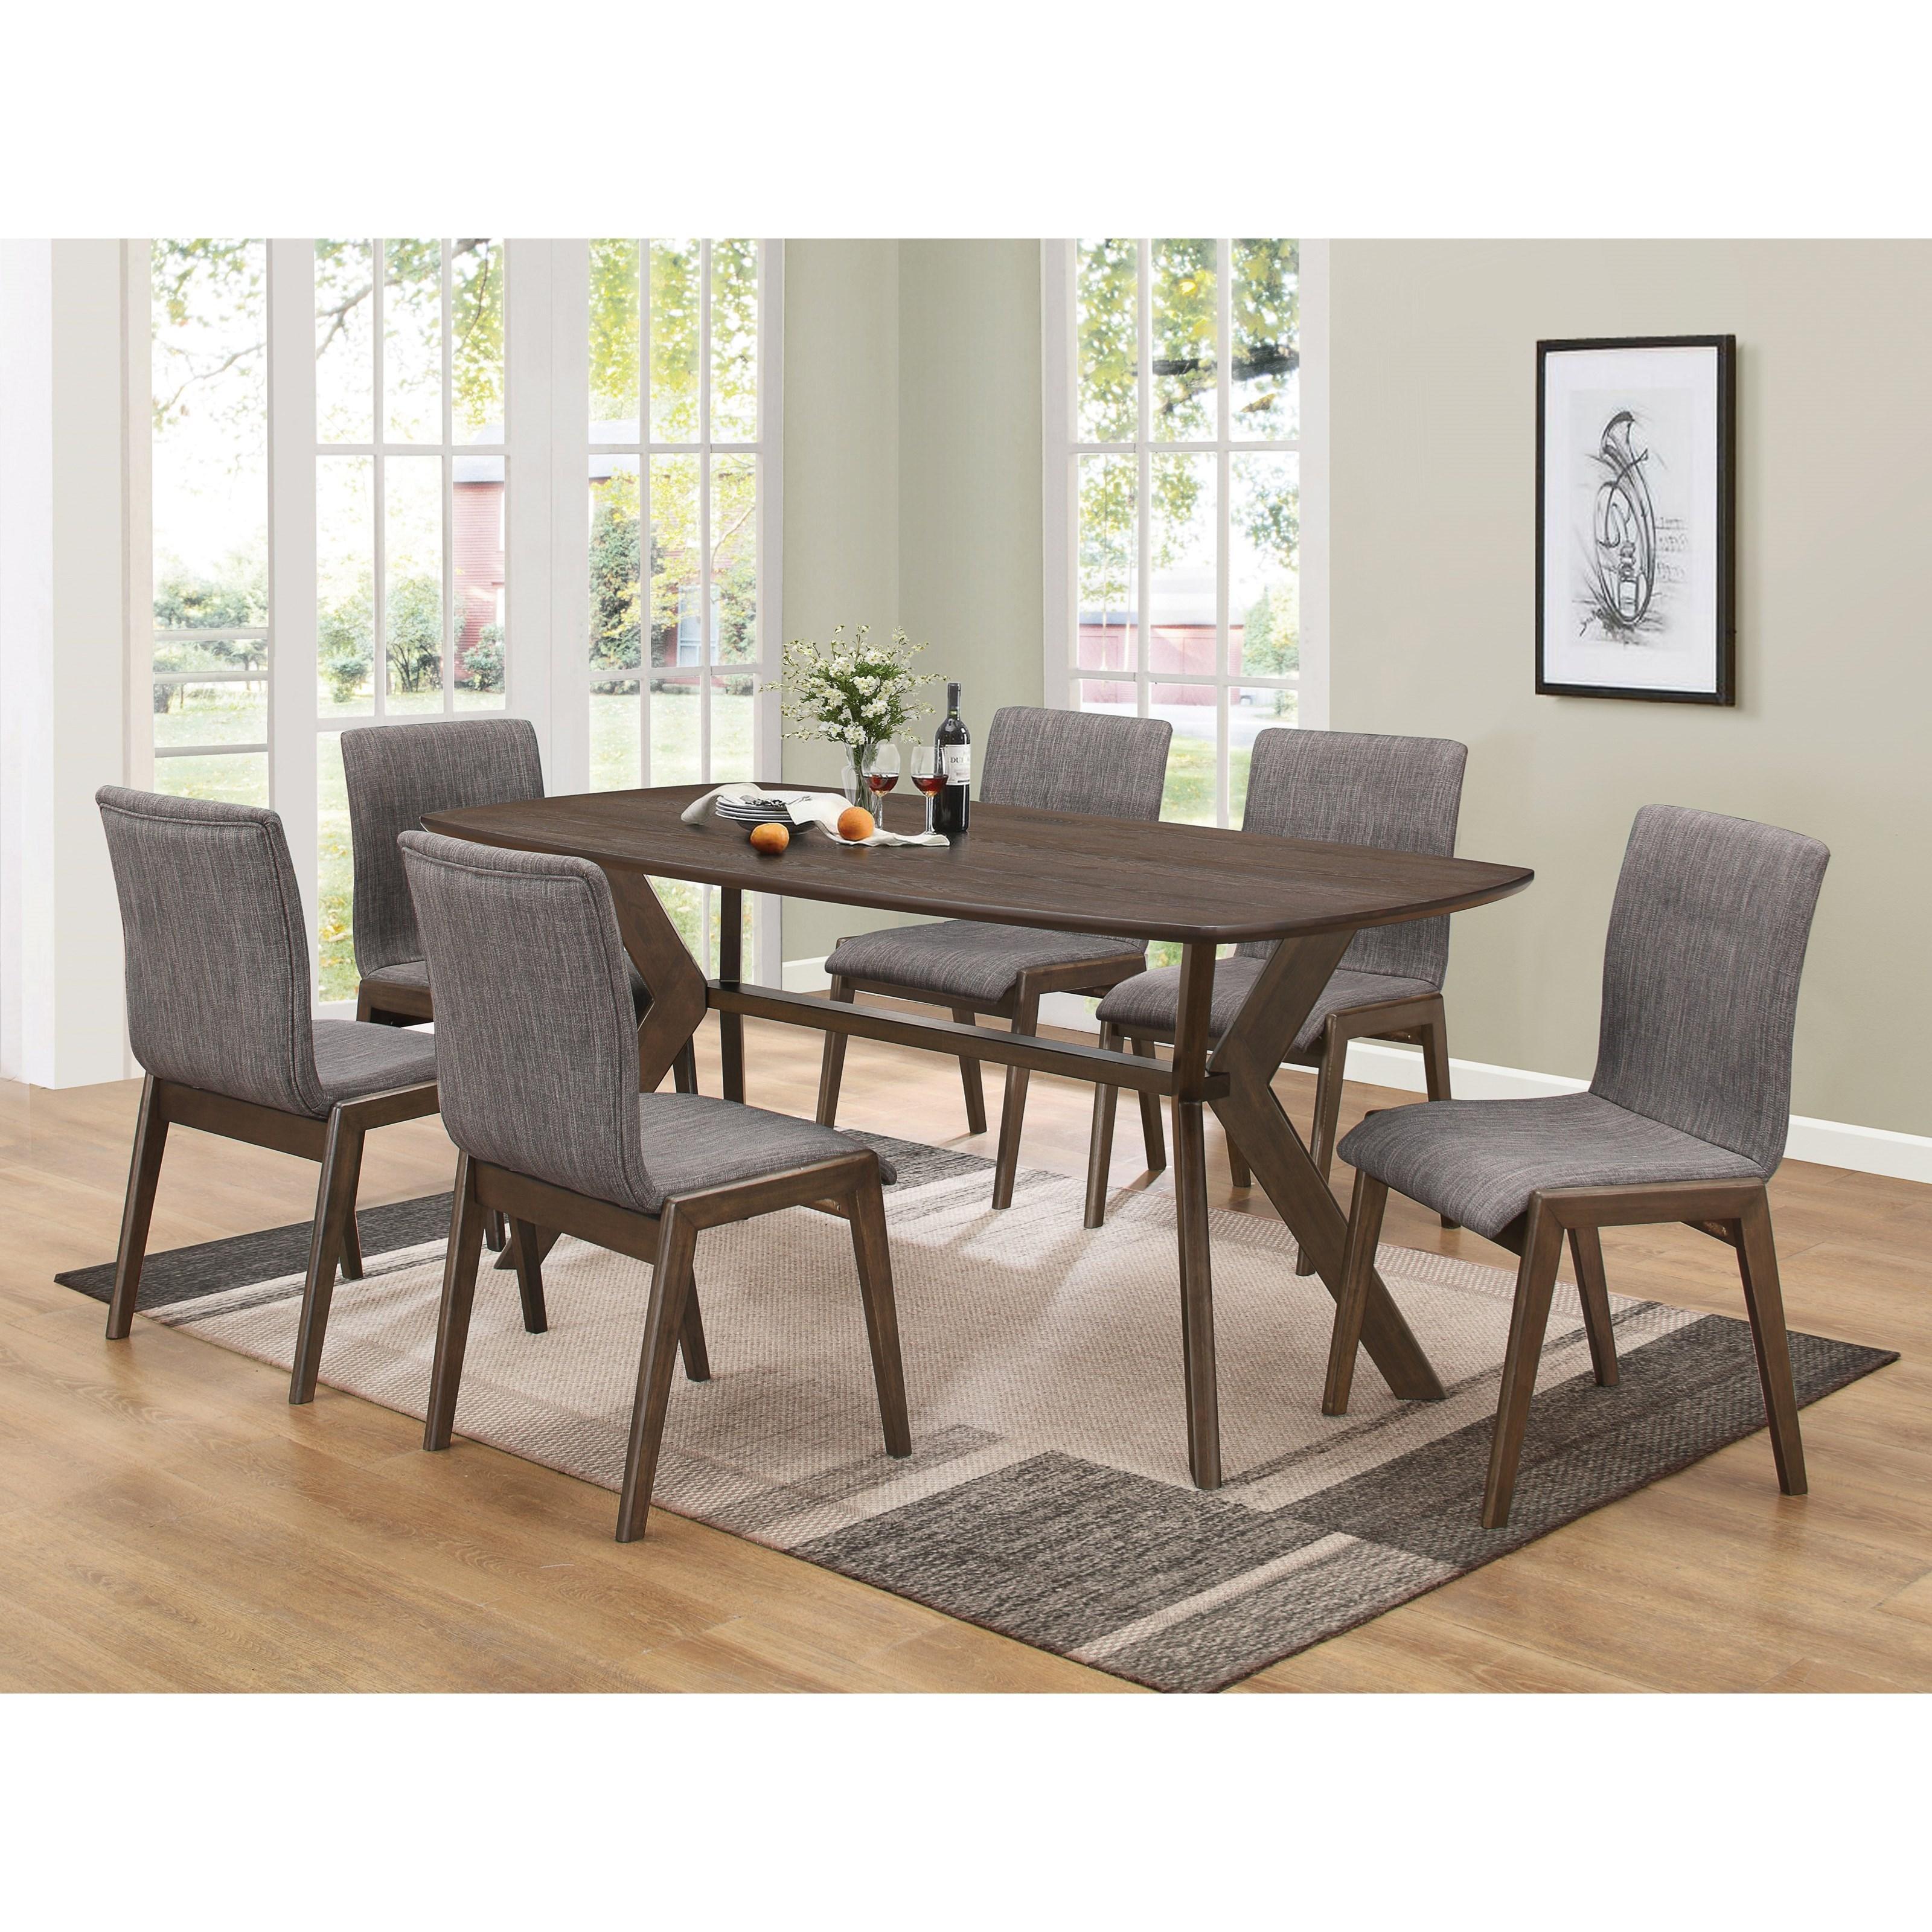 Retro Dining Room Set: Coaster McBride Retro Table And Chair Set